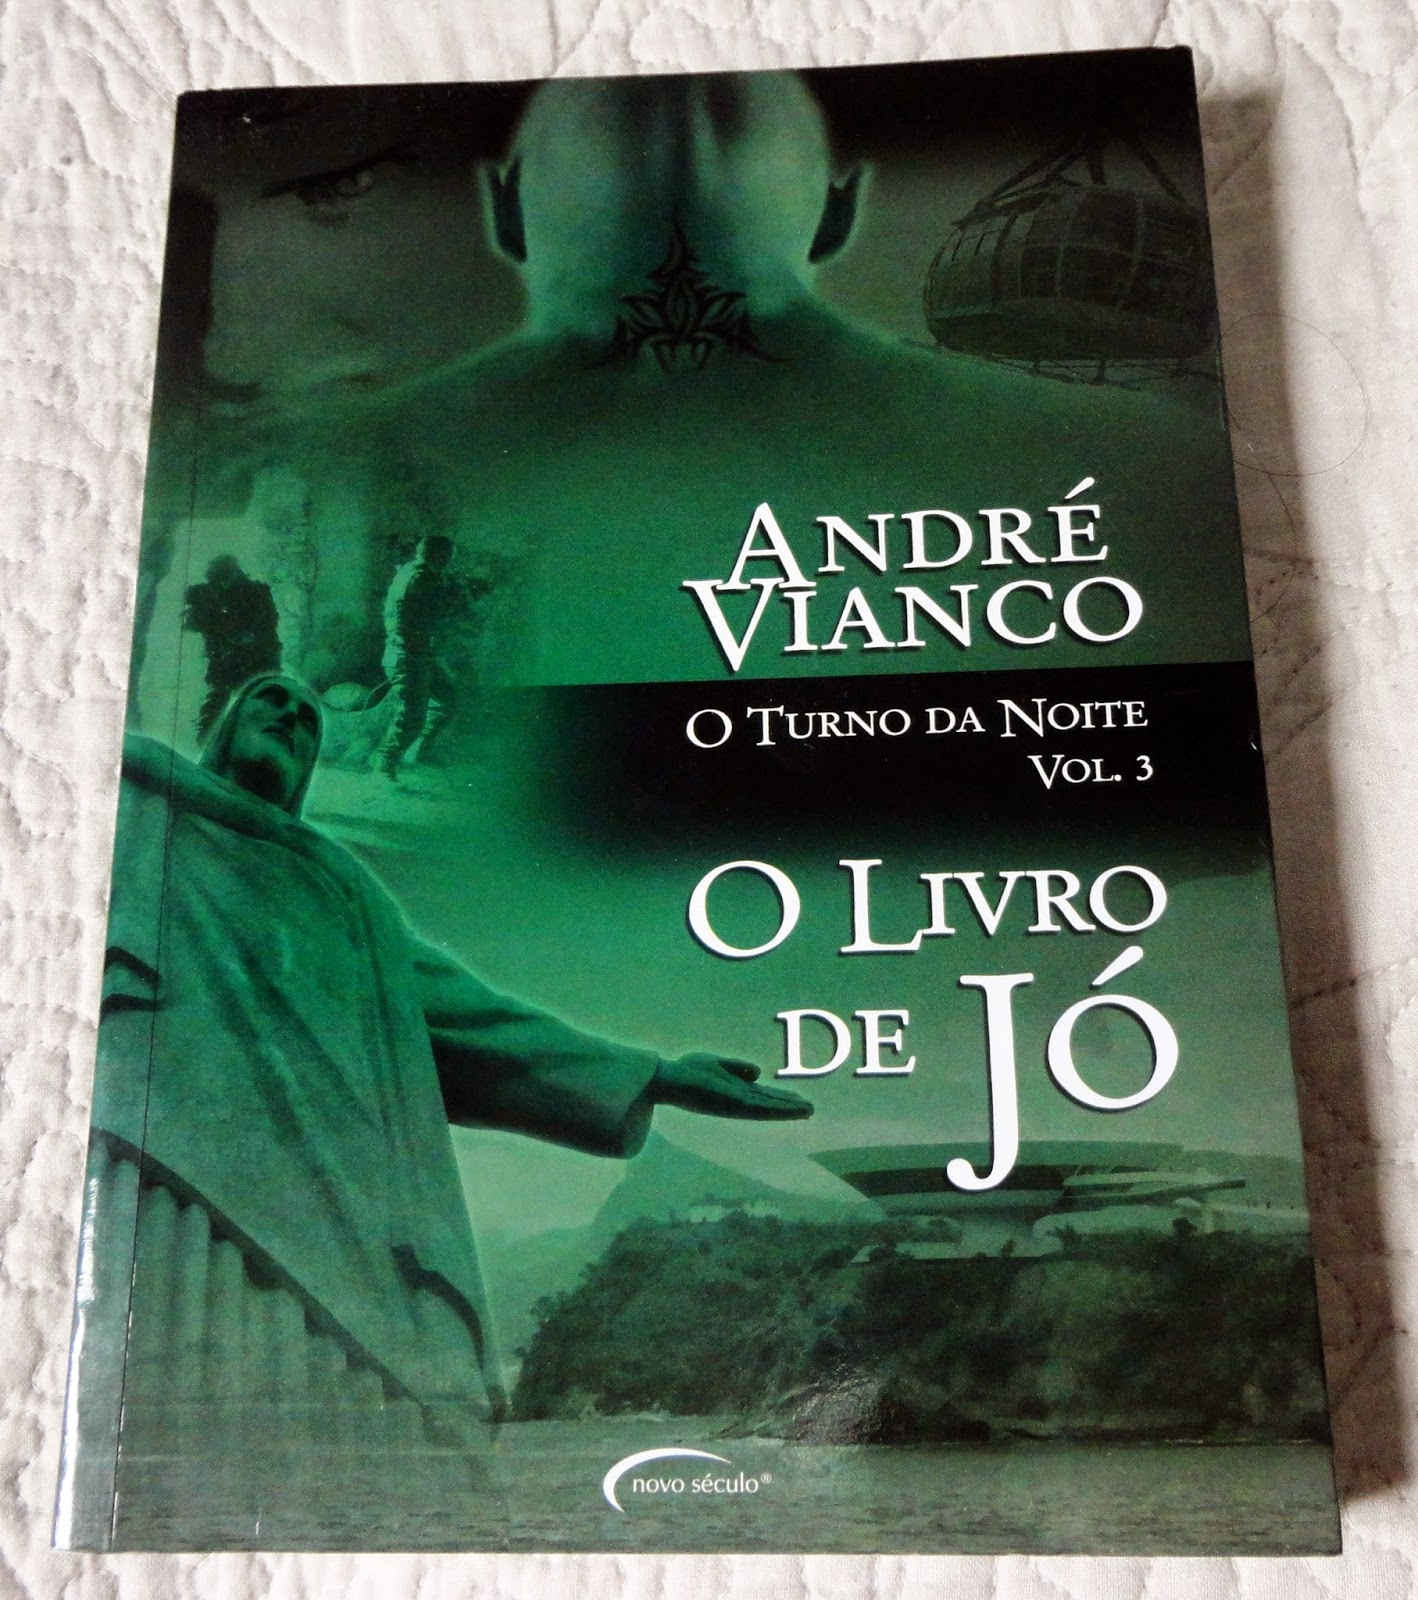 André Vianco